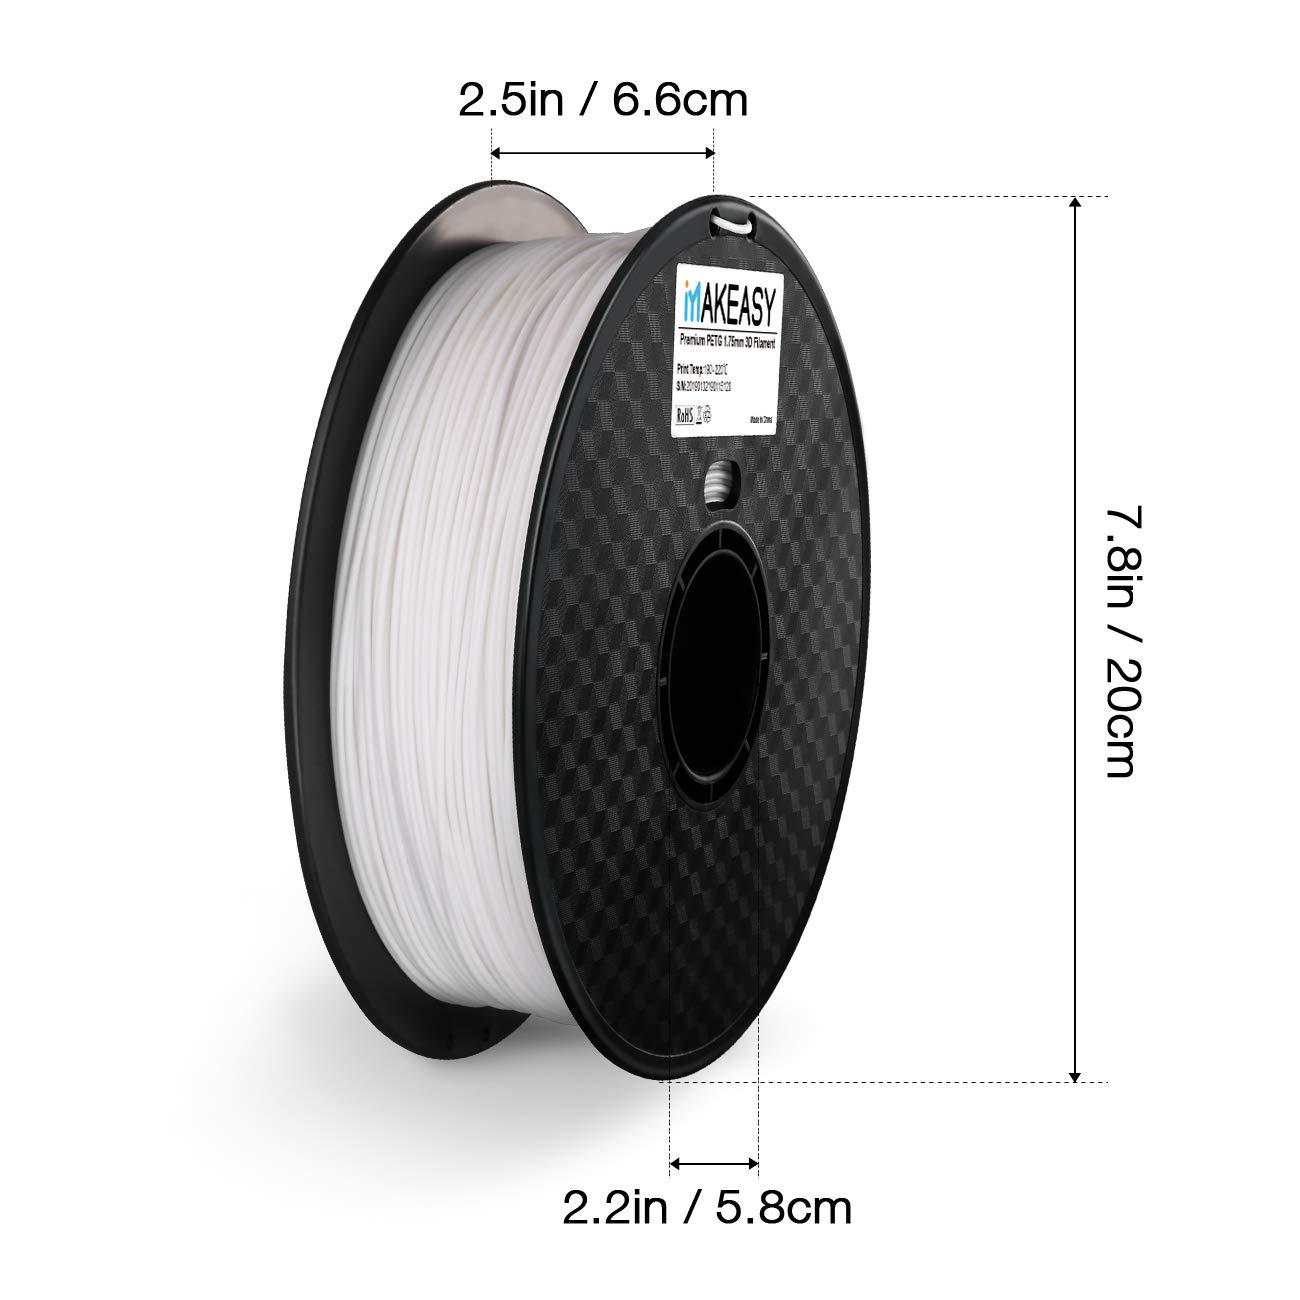 1 MAKEASY para impresora 3D 1 kg Spool 3D Printer Filamento 1,75 mm PETG Negro